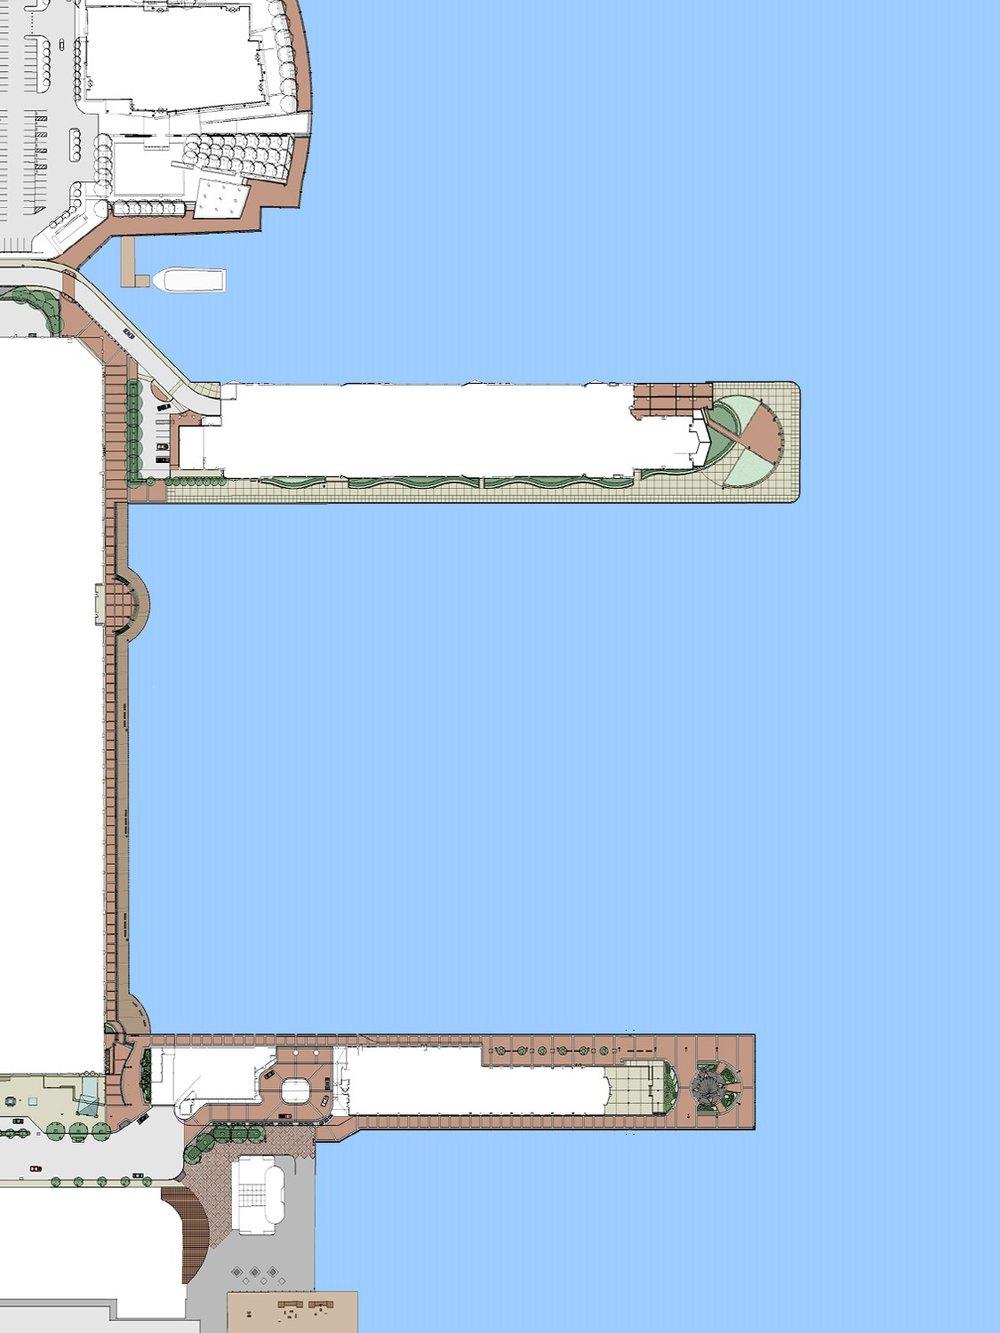 B_Waterfront Promenade_Harborside.jpg